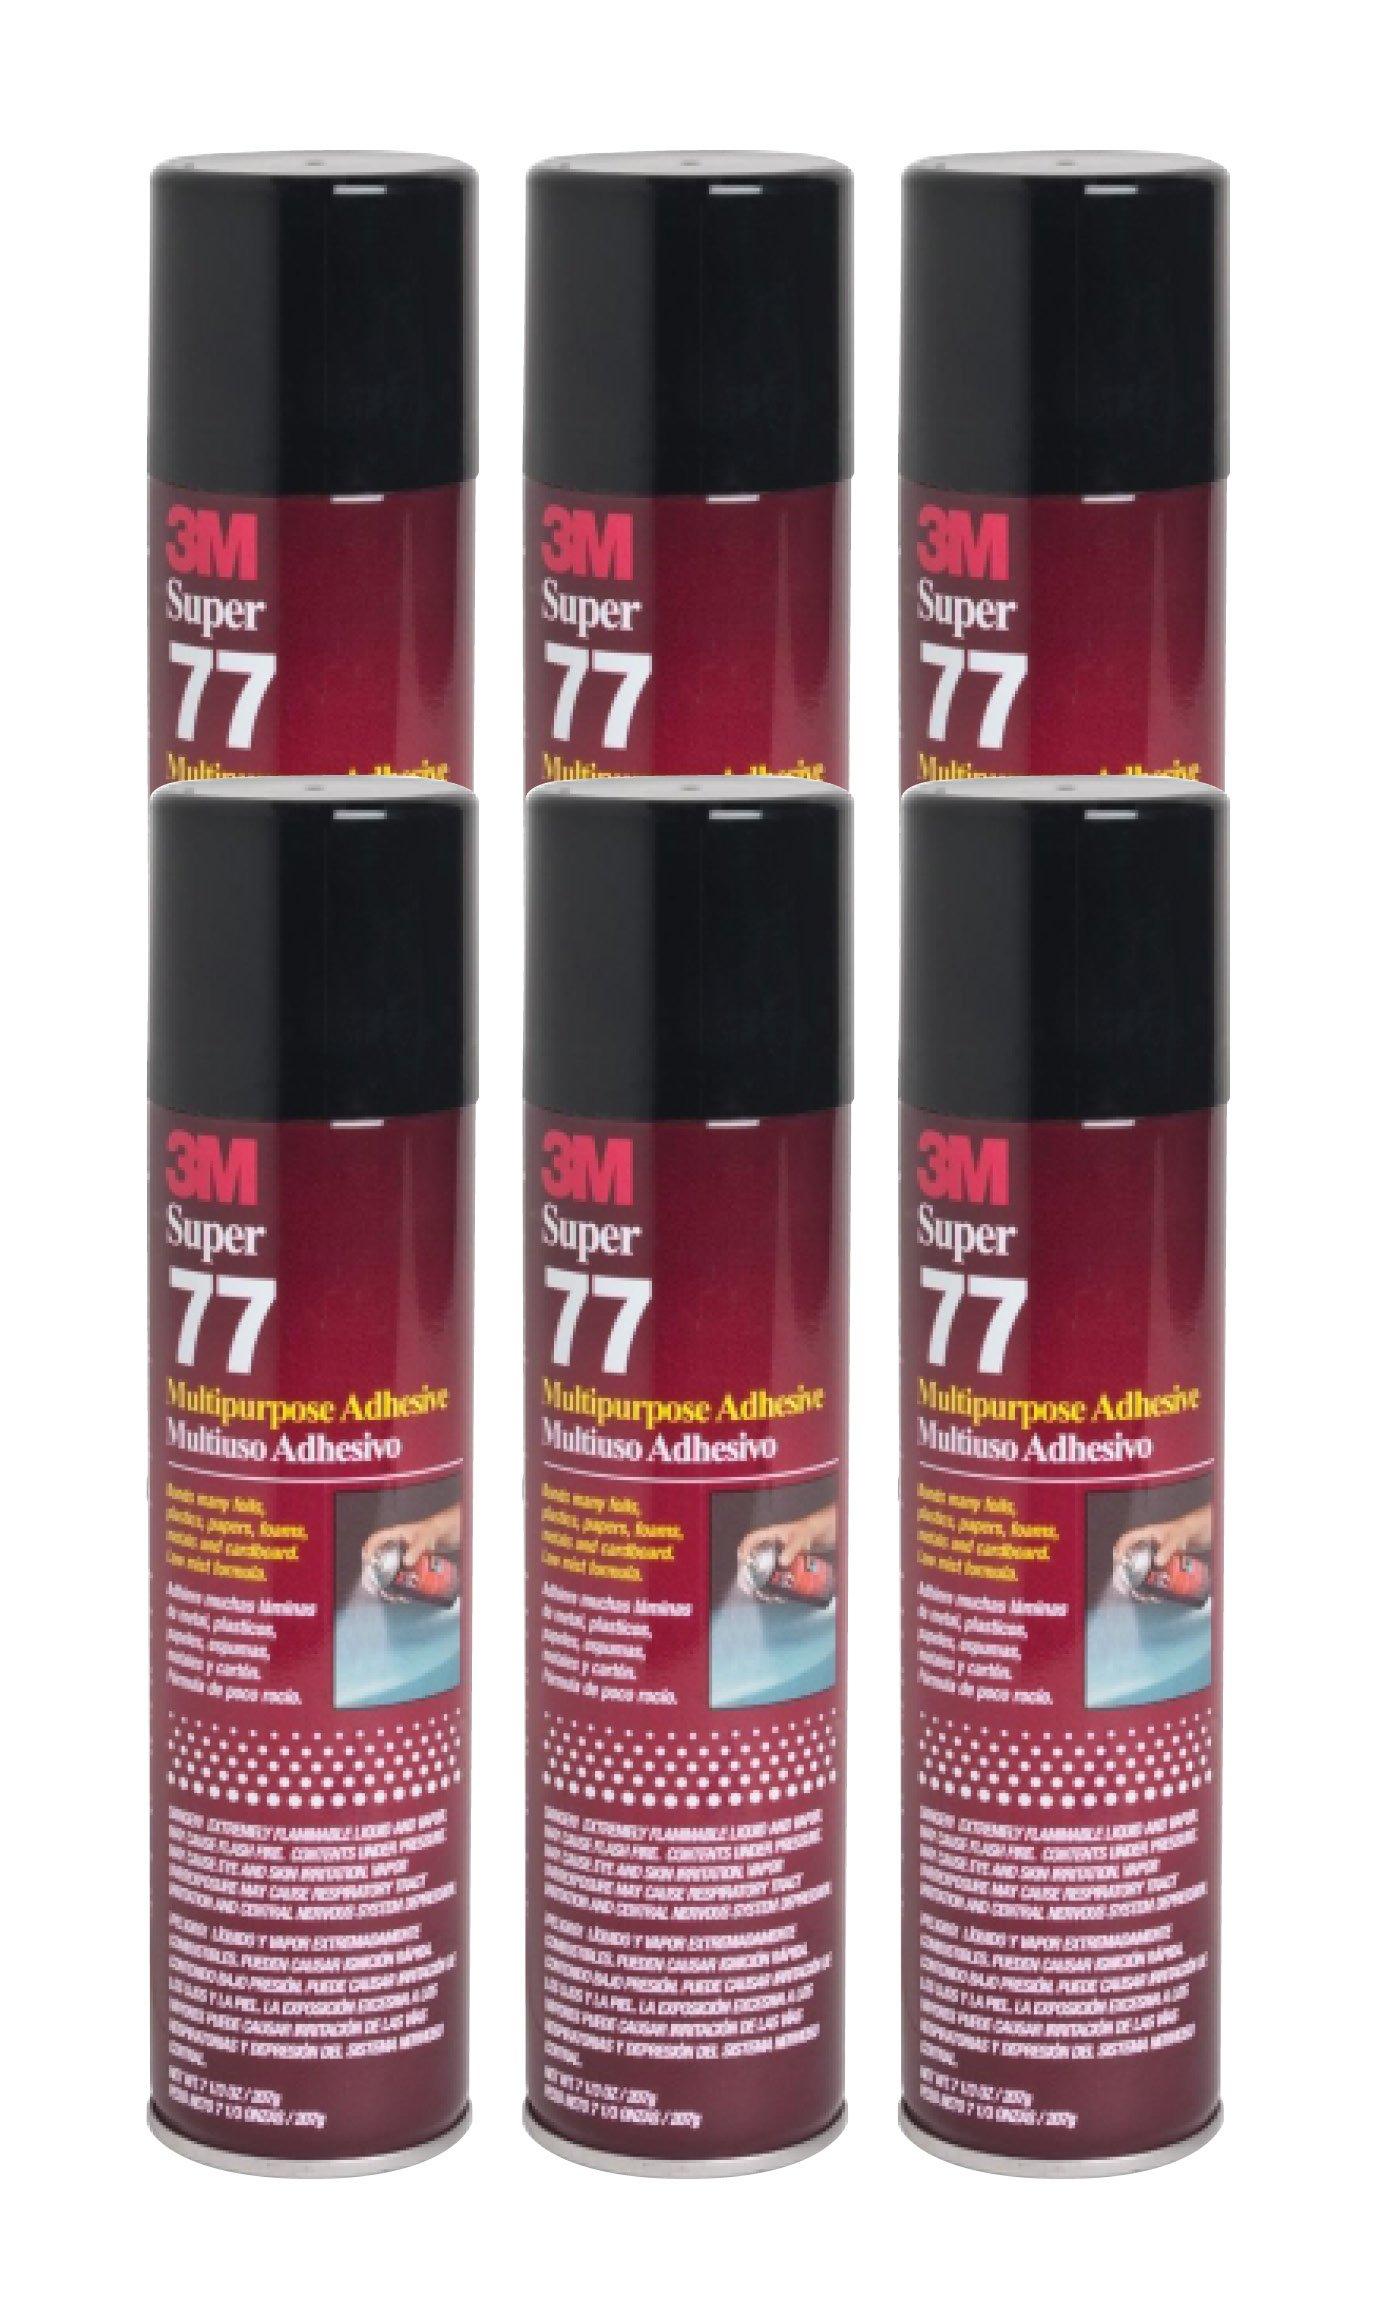 QTY6 3M SUPER 77 7.3oz SPRAY GLUE ADHESIVE for SPEAKER BOX ENCLOSURE